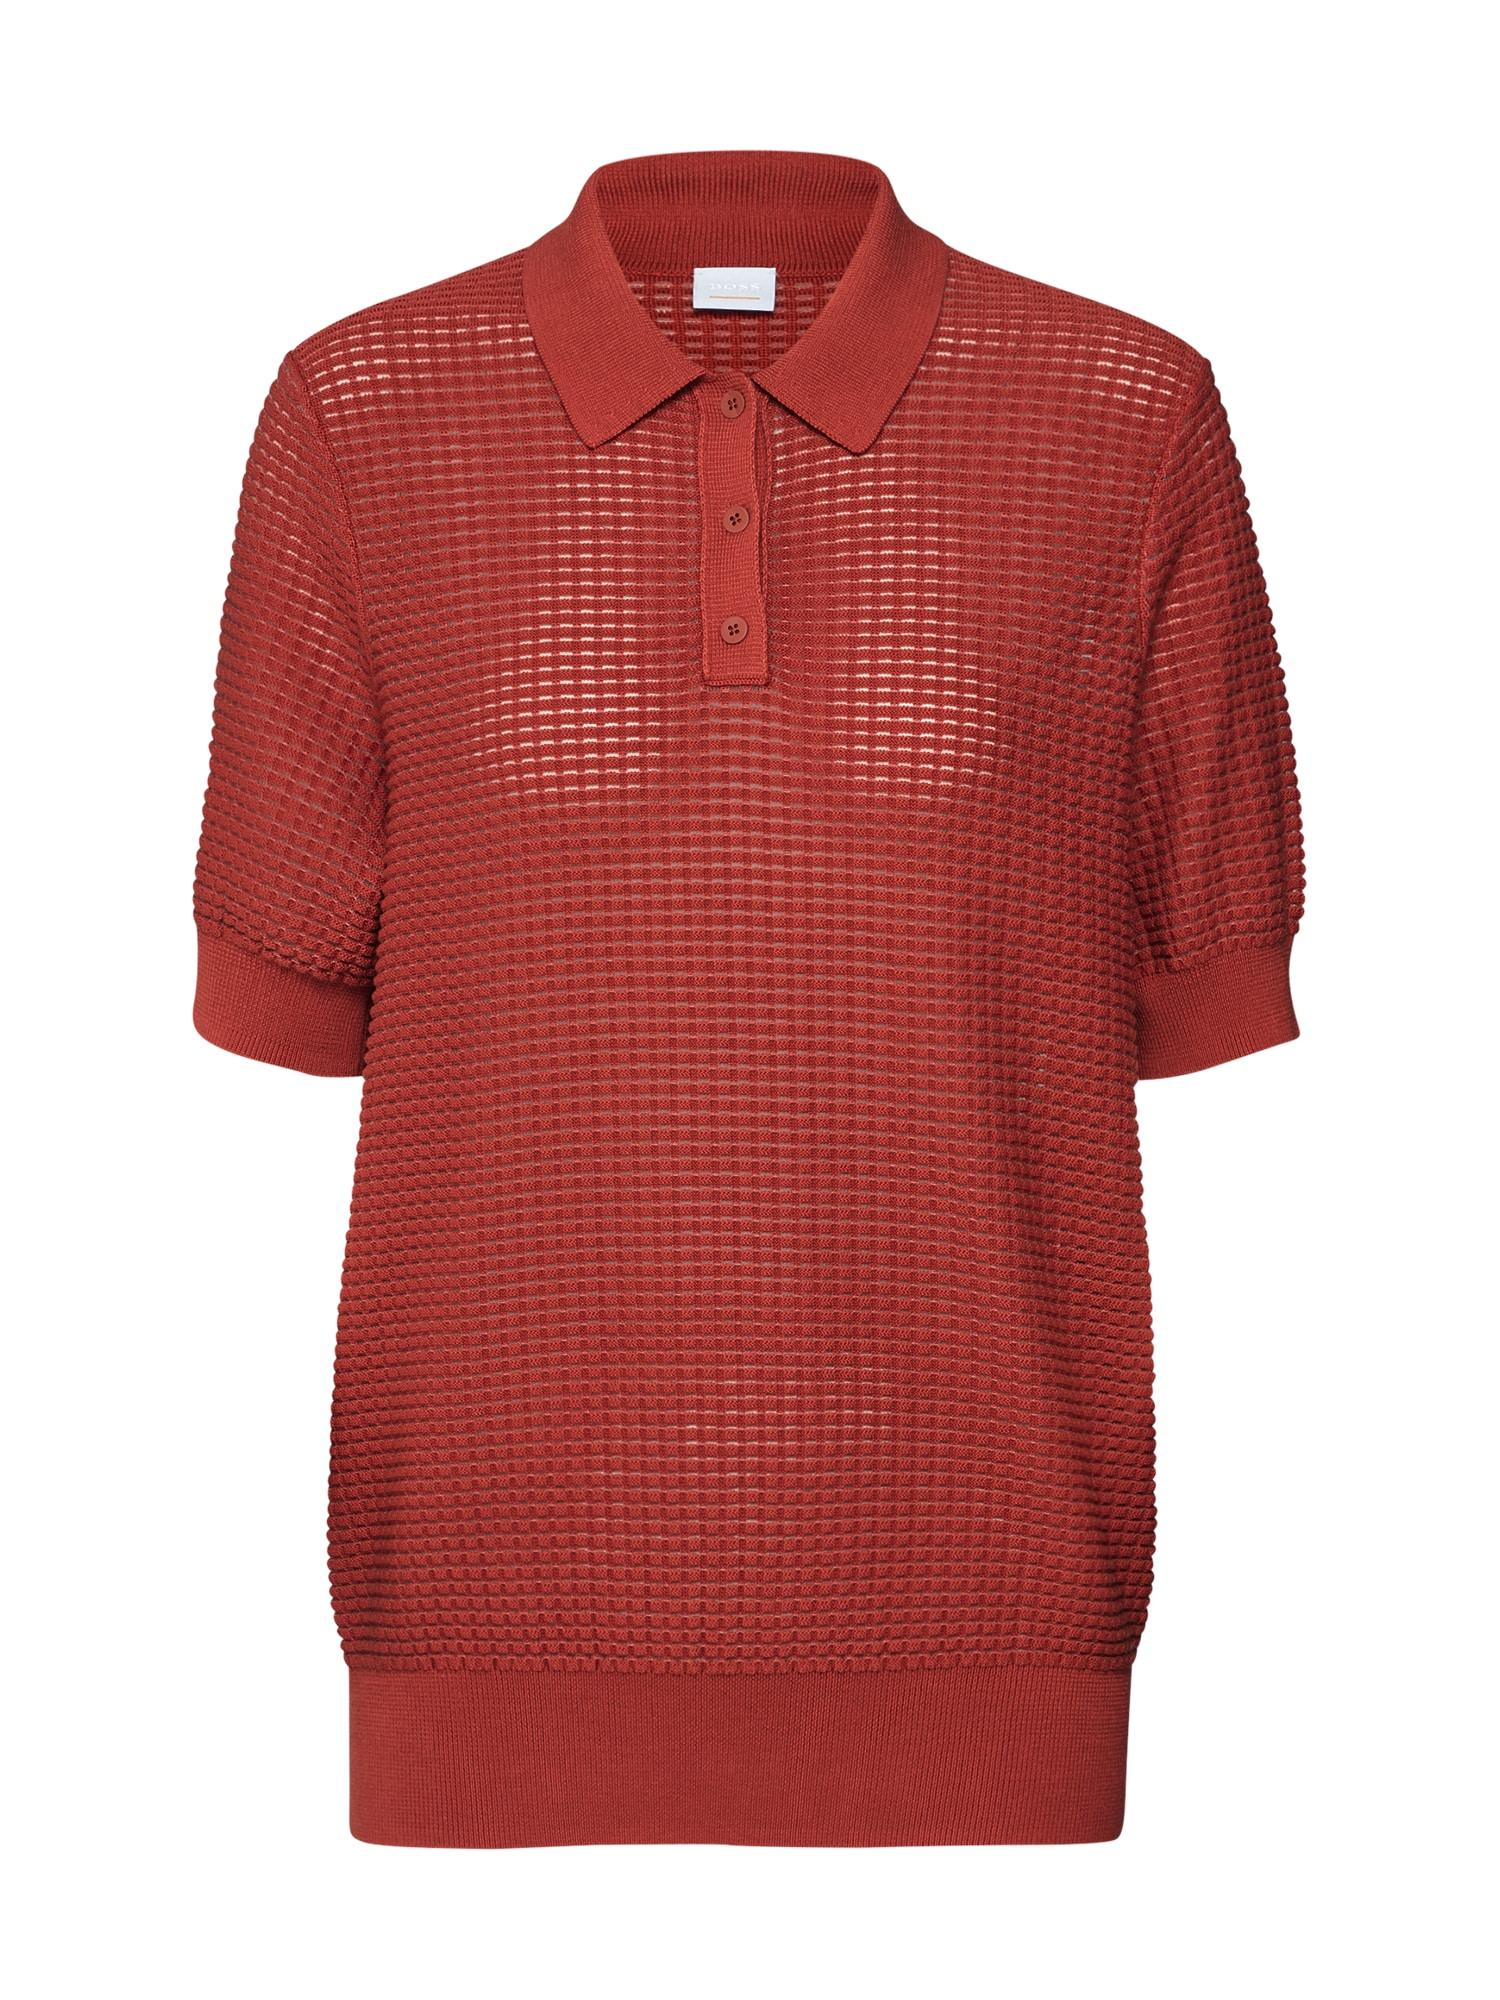 BOSS Megztinis 'Wilouise' raudona